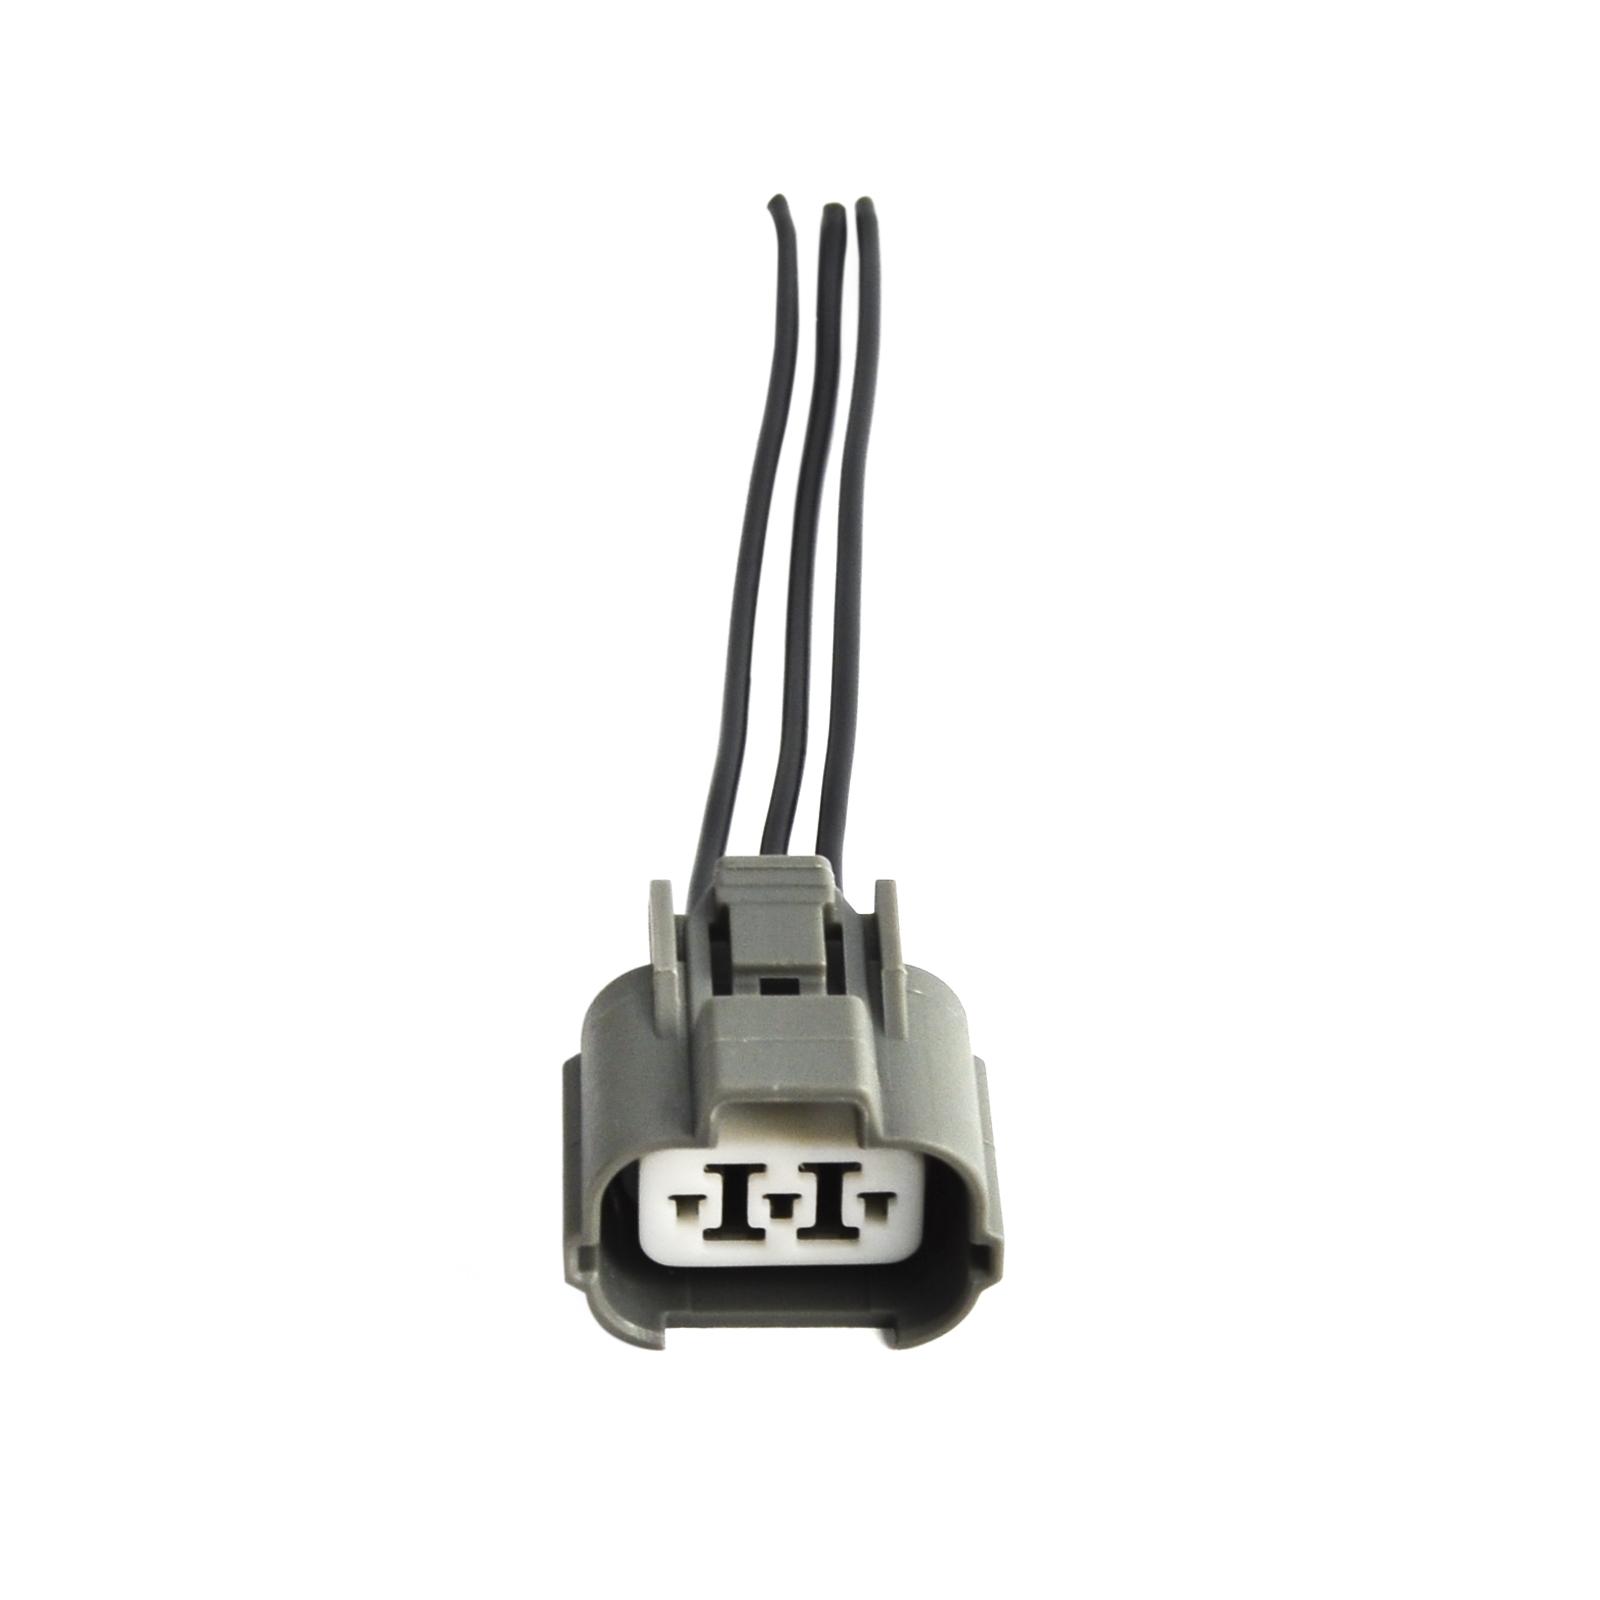 1990 Honda Civic Wiring Harness Tail : speed sensor wiring plug pig tail harness plug for honda ~ A.2002-acura-tl-radio.info Haus und Dekorationen